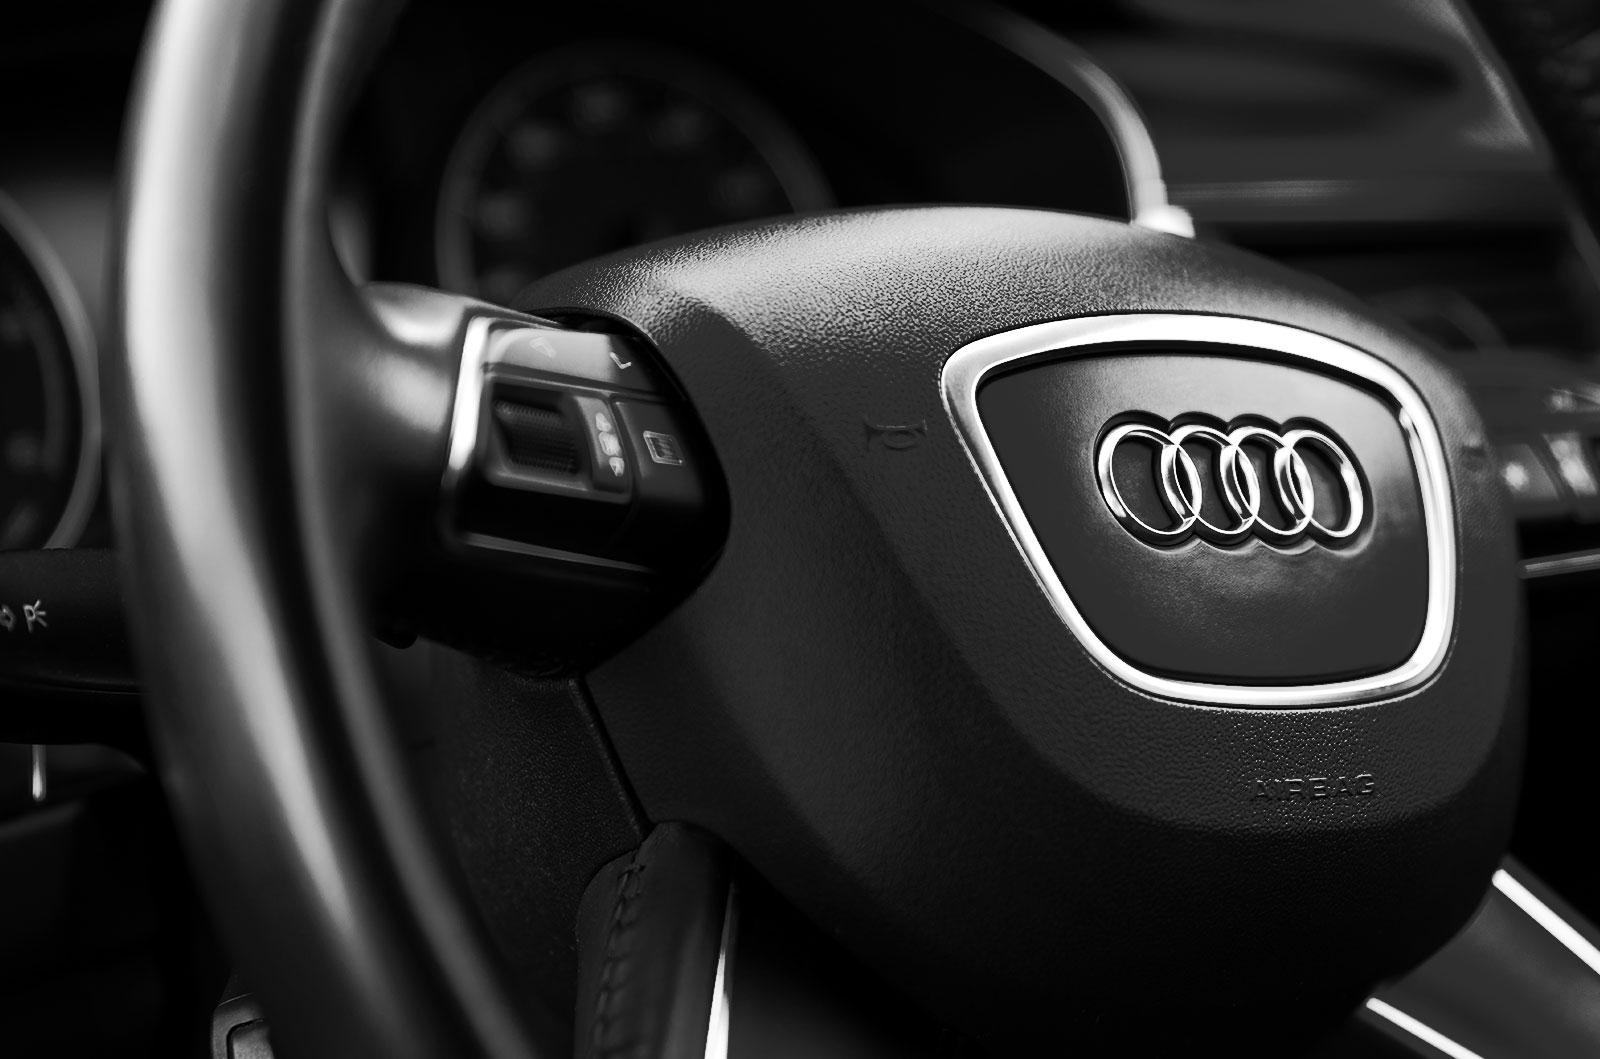 Audi Repair Specialists Warrington - CJ Auto